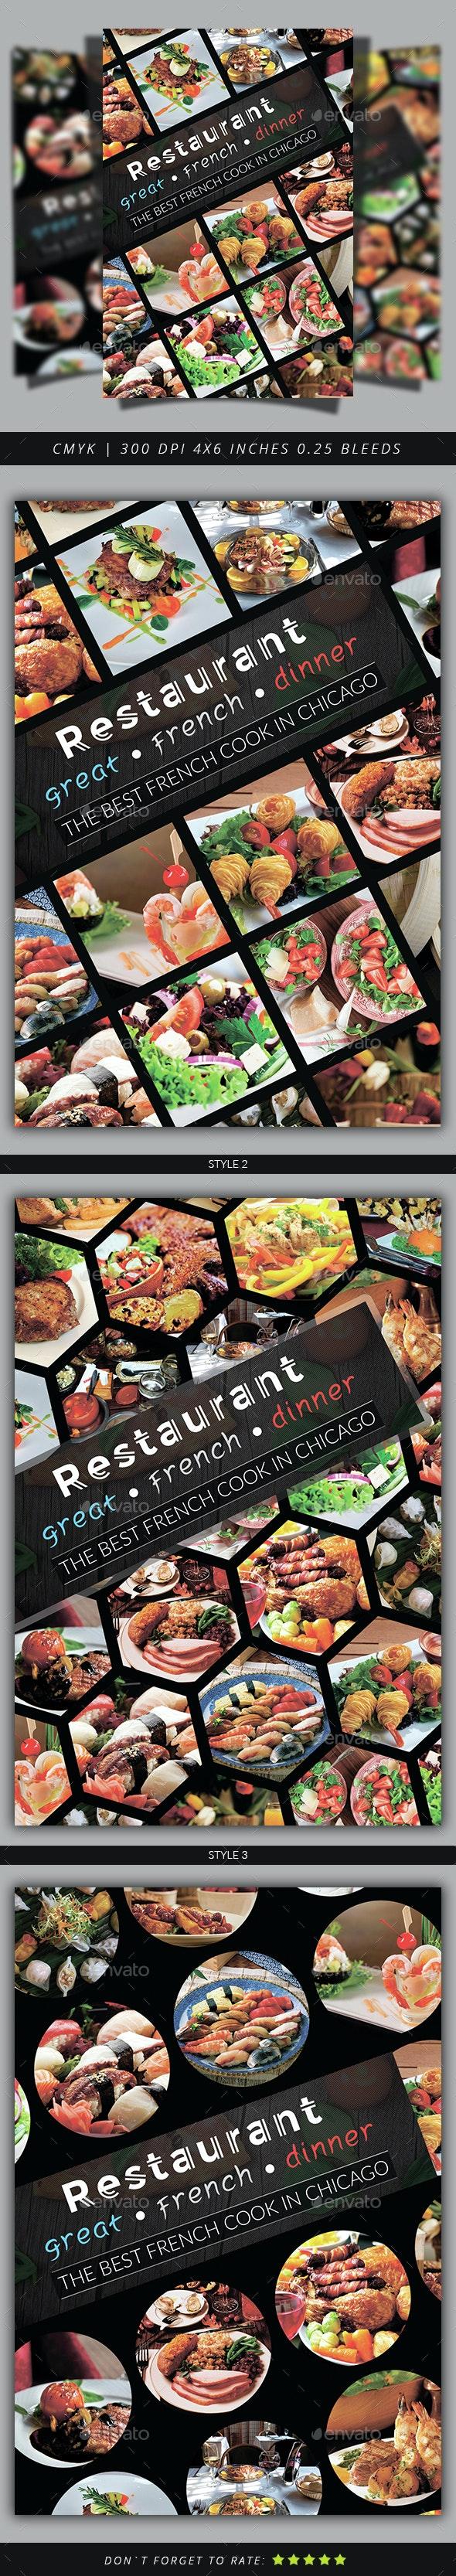 Restaurant Flyer Template - Restaurant Flyers